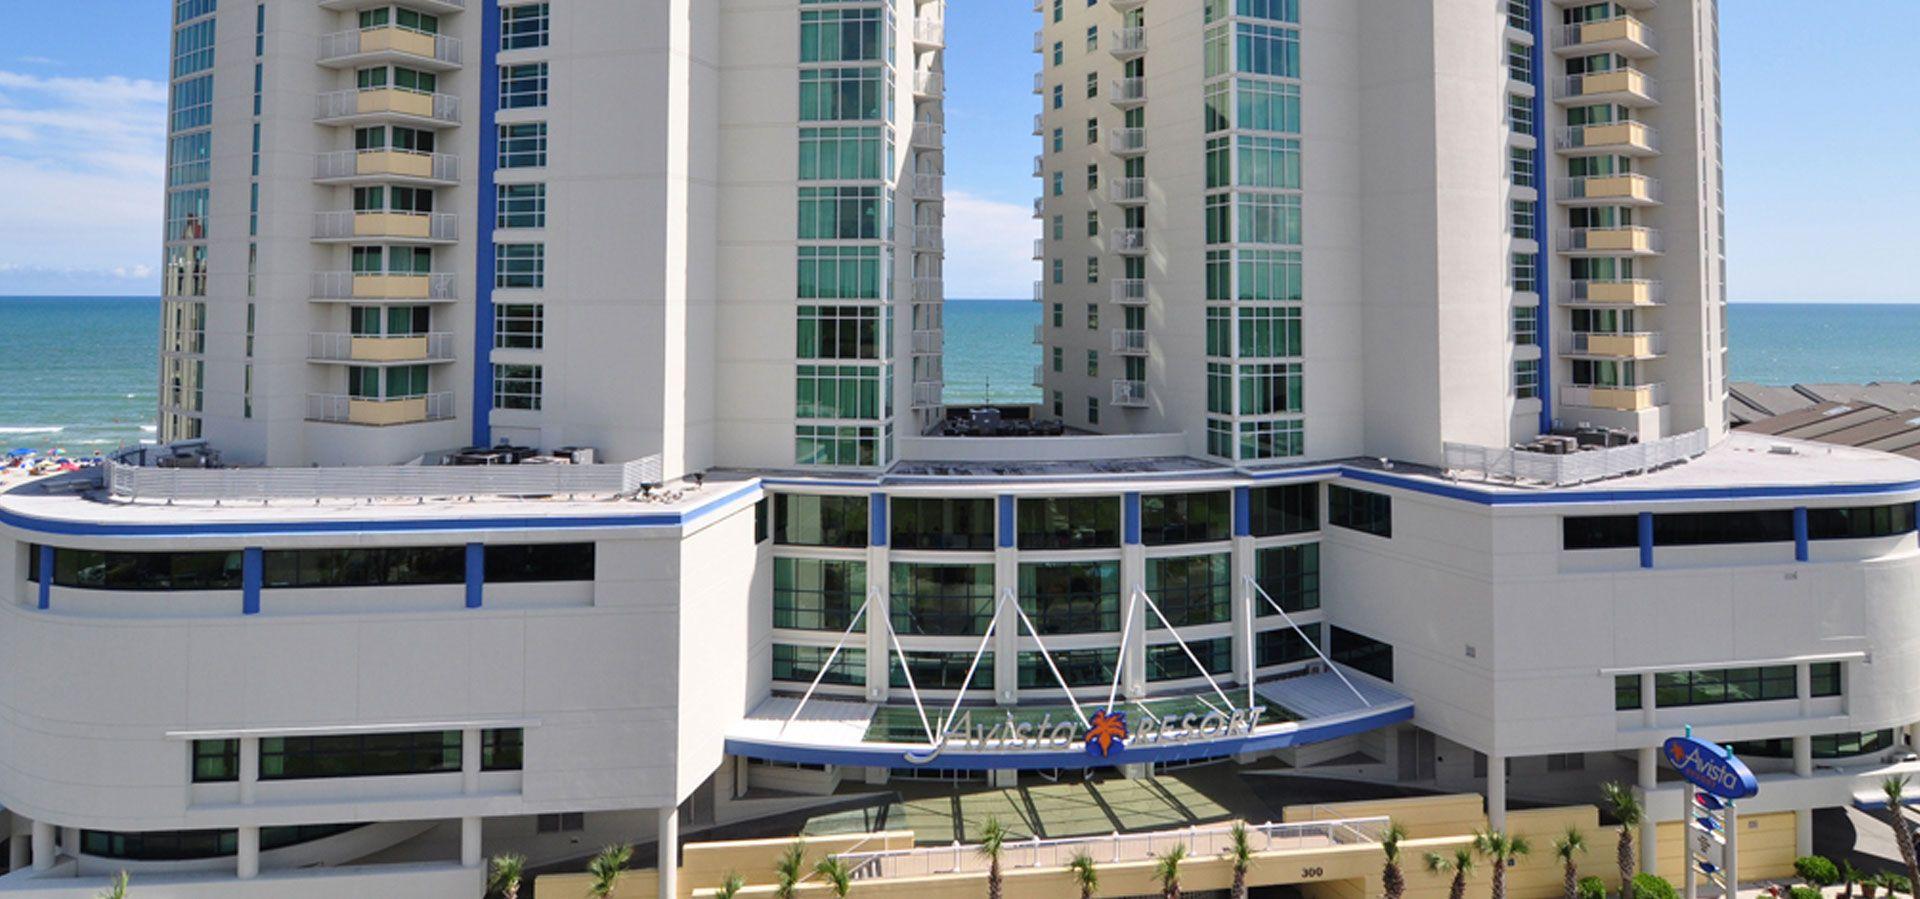 North Myrtle Beach Resorts The Avista Resort South Carolina